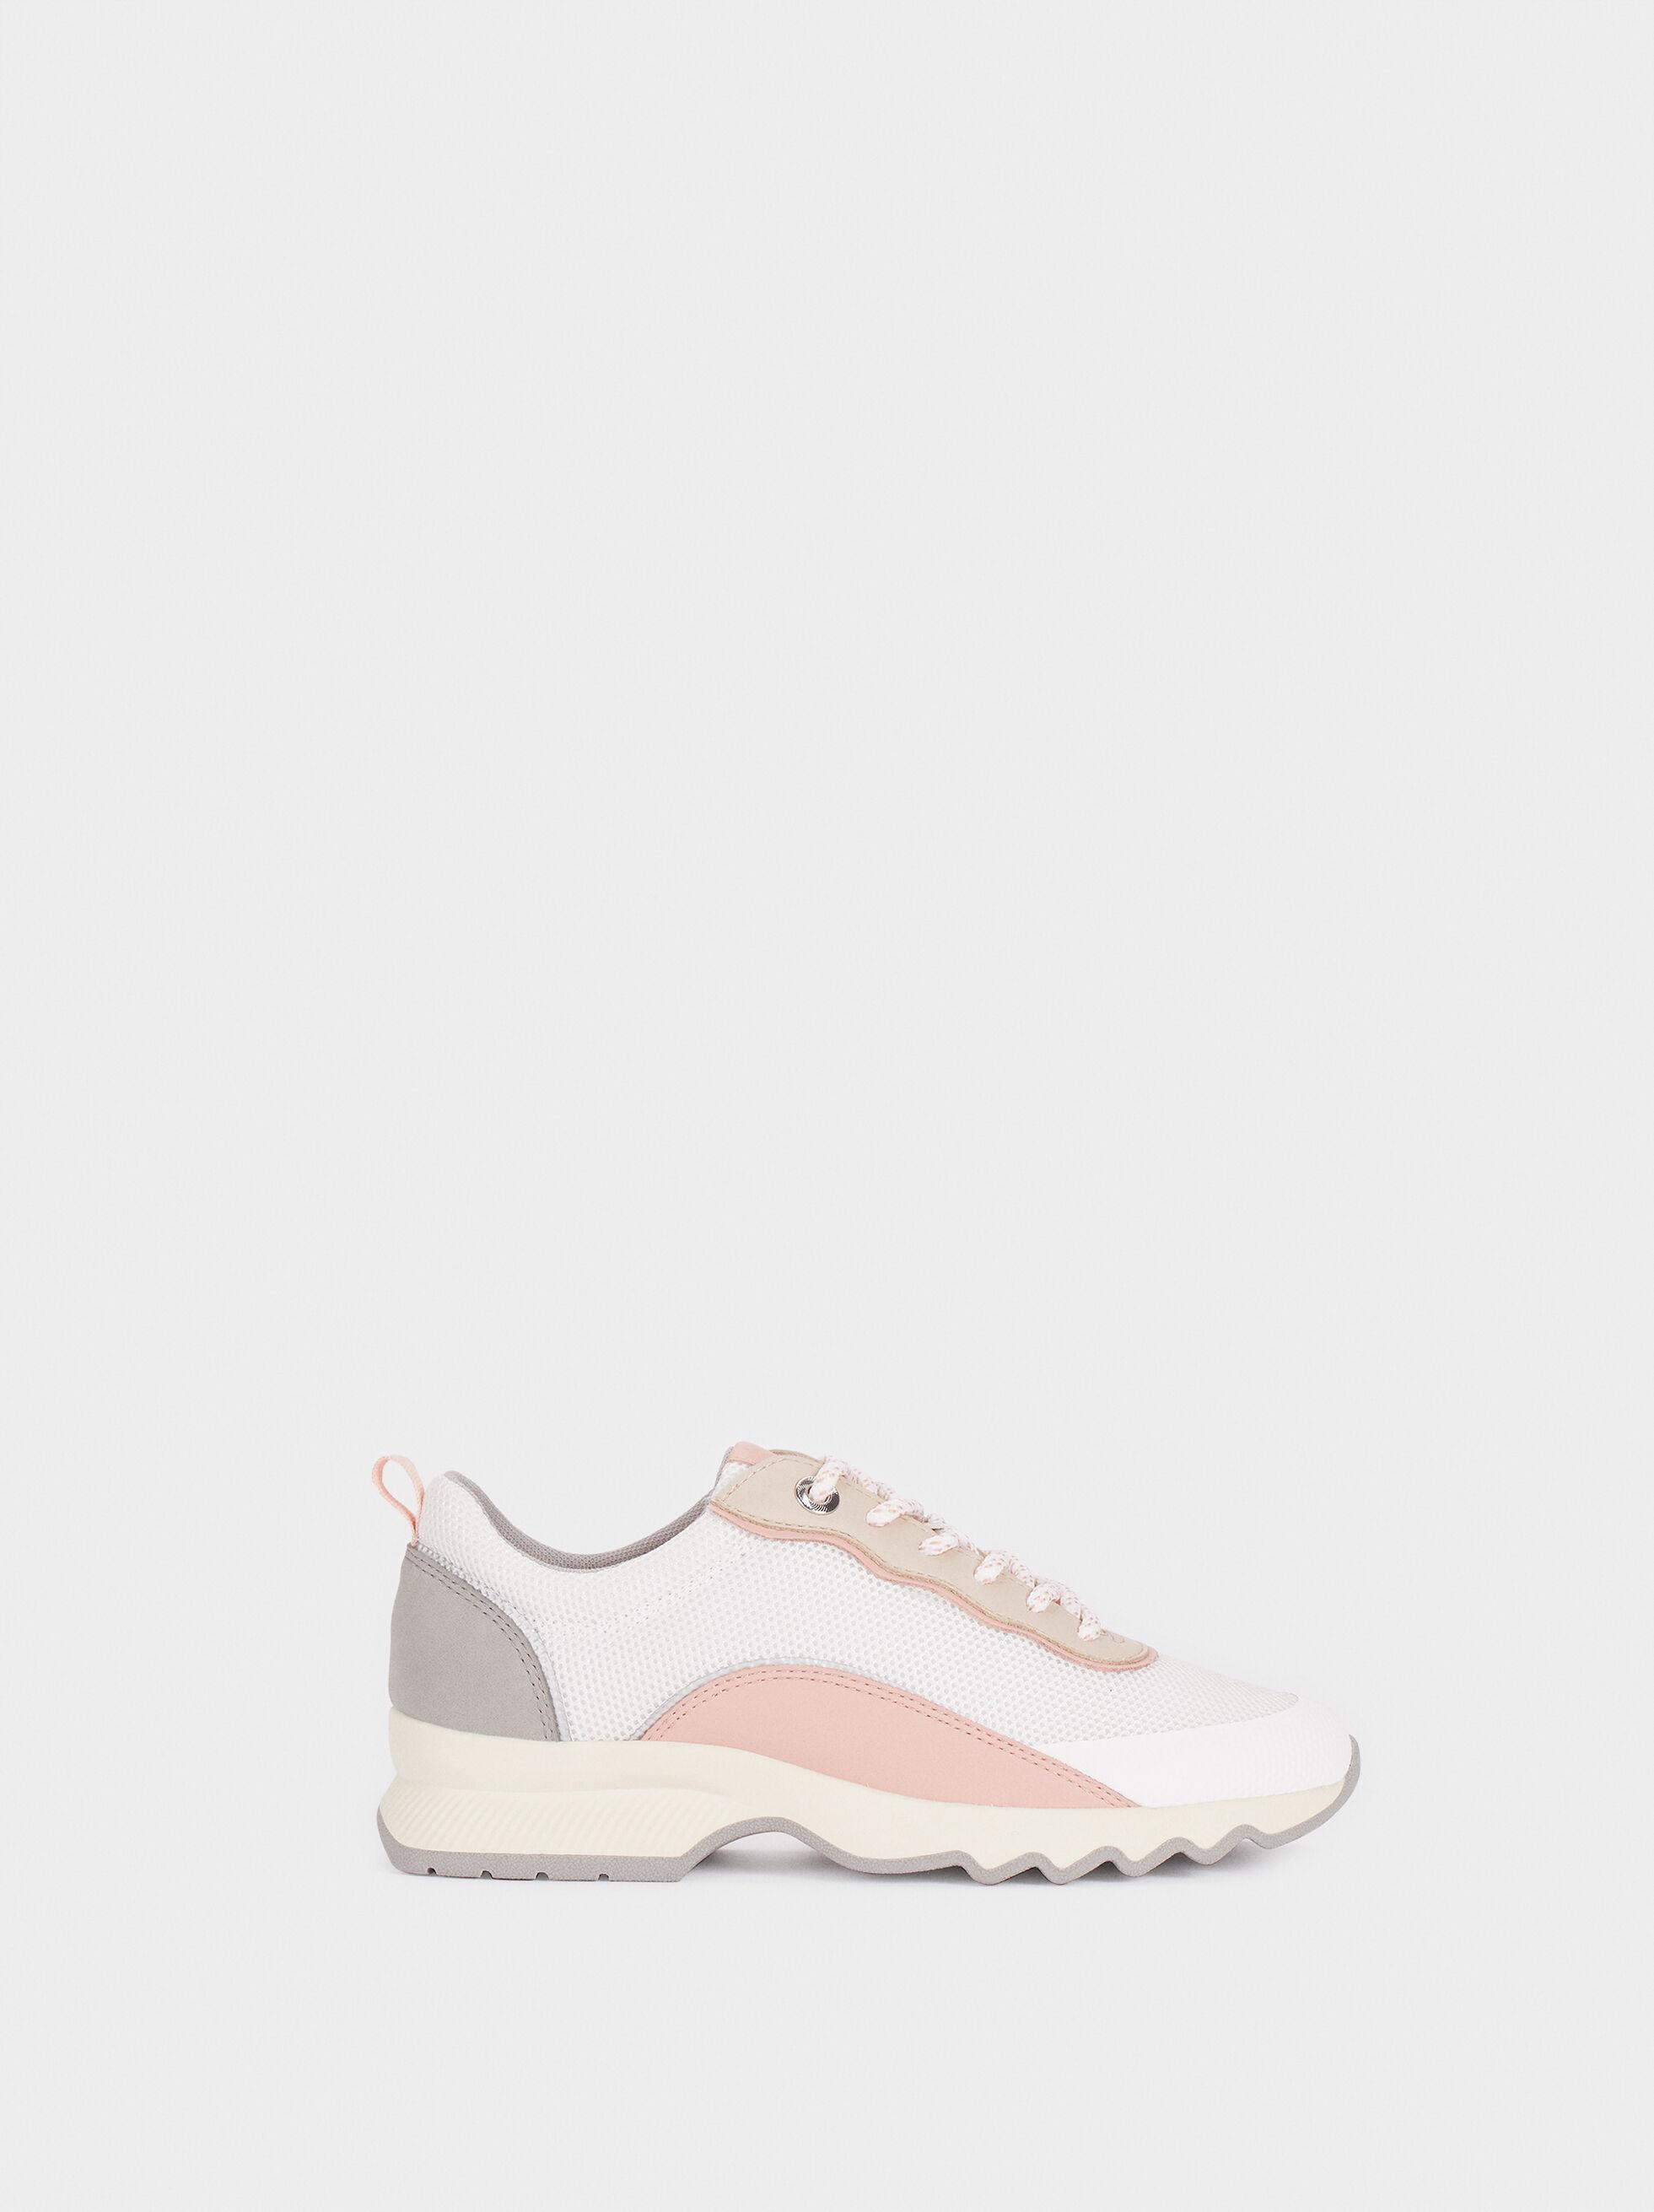 Chaussures De Sport Contrastantes, , hi-res